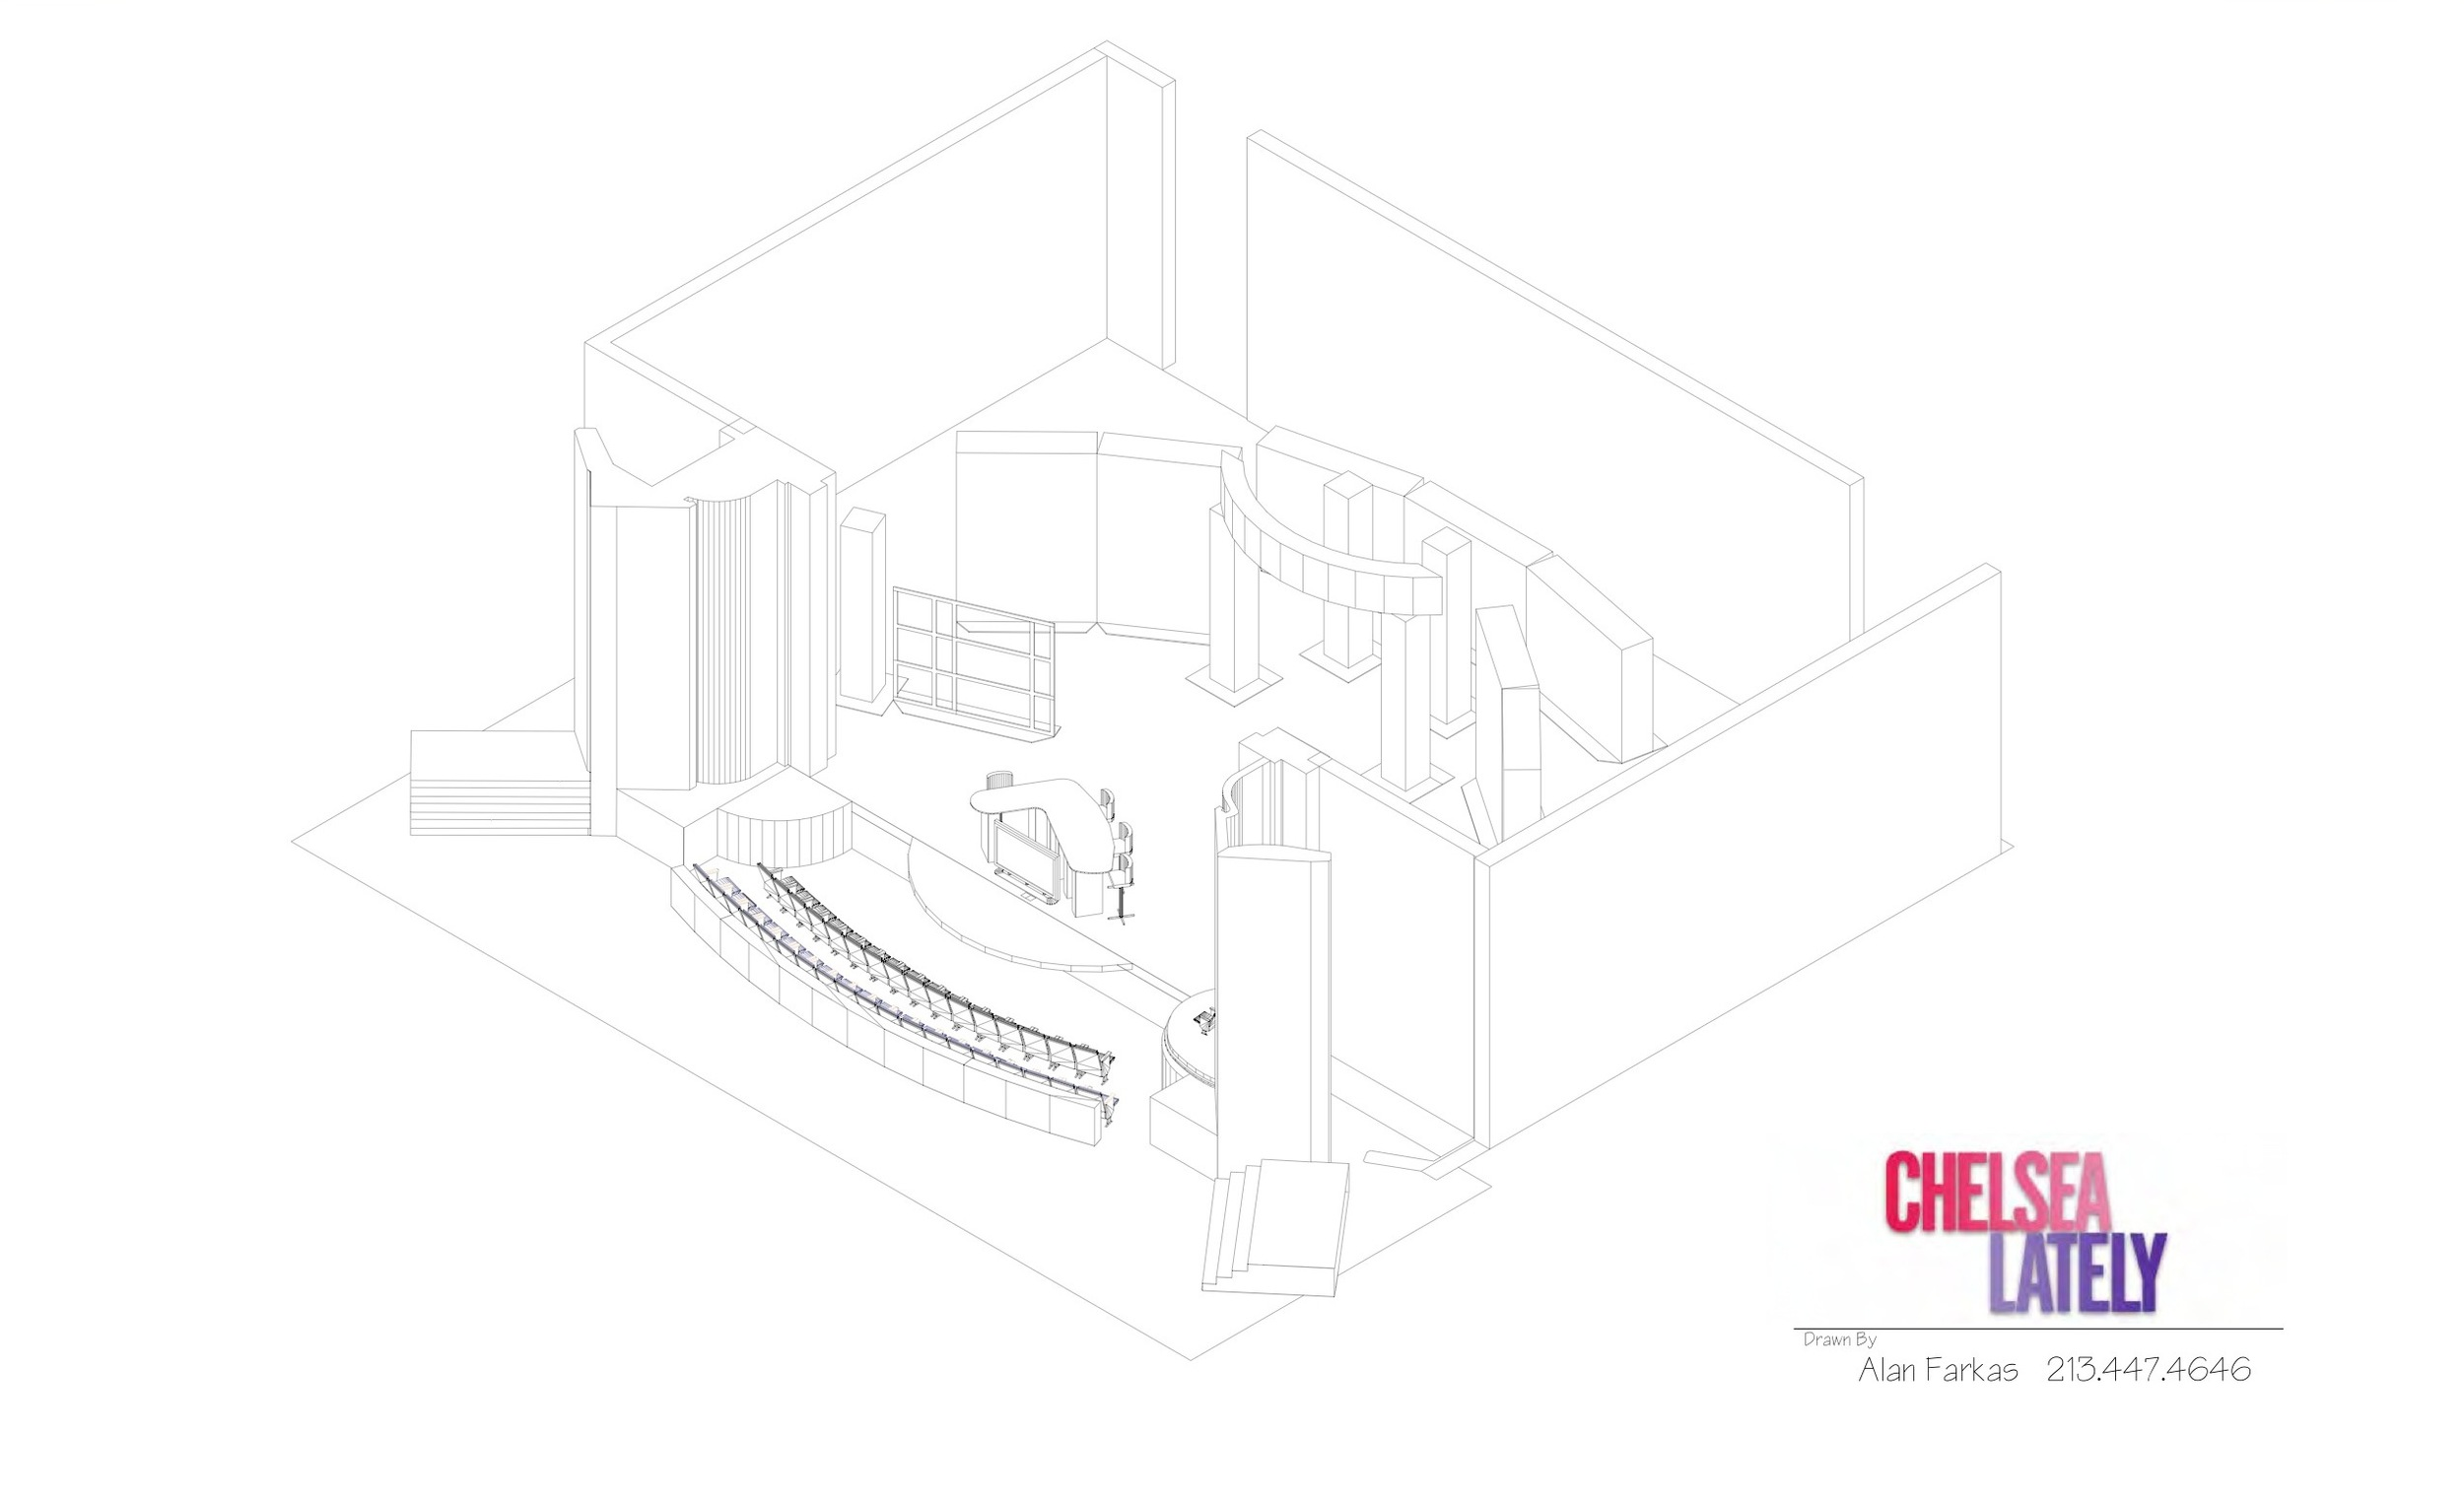 Alan Farkas_3D Set Design + Illustration_Reduced 21.jpeg